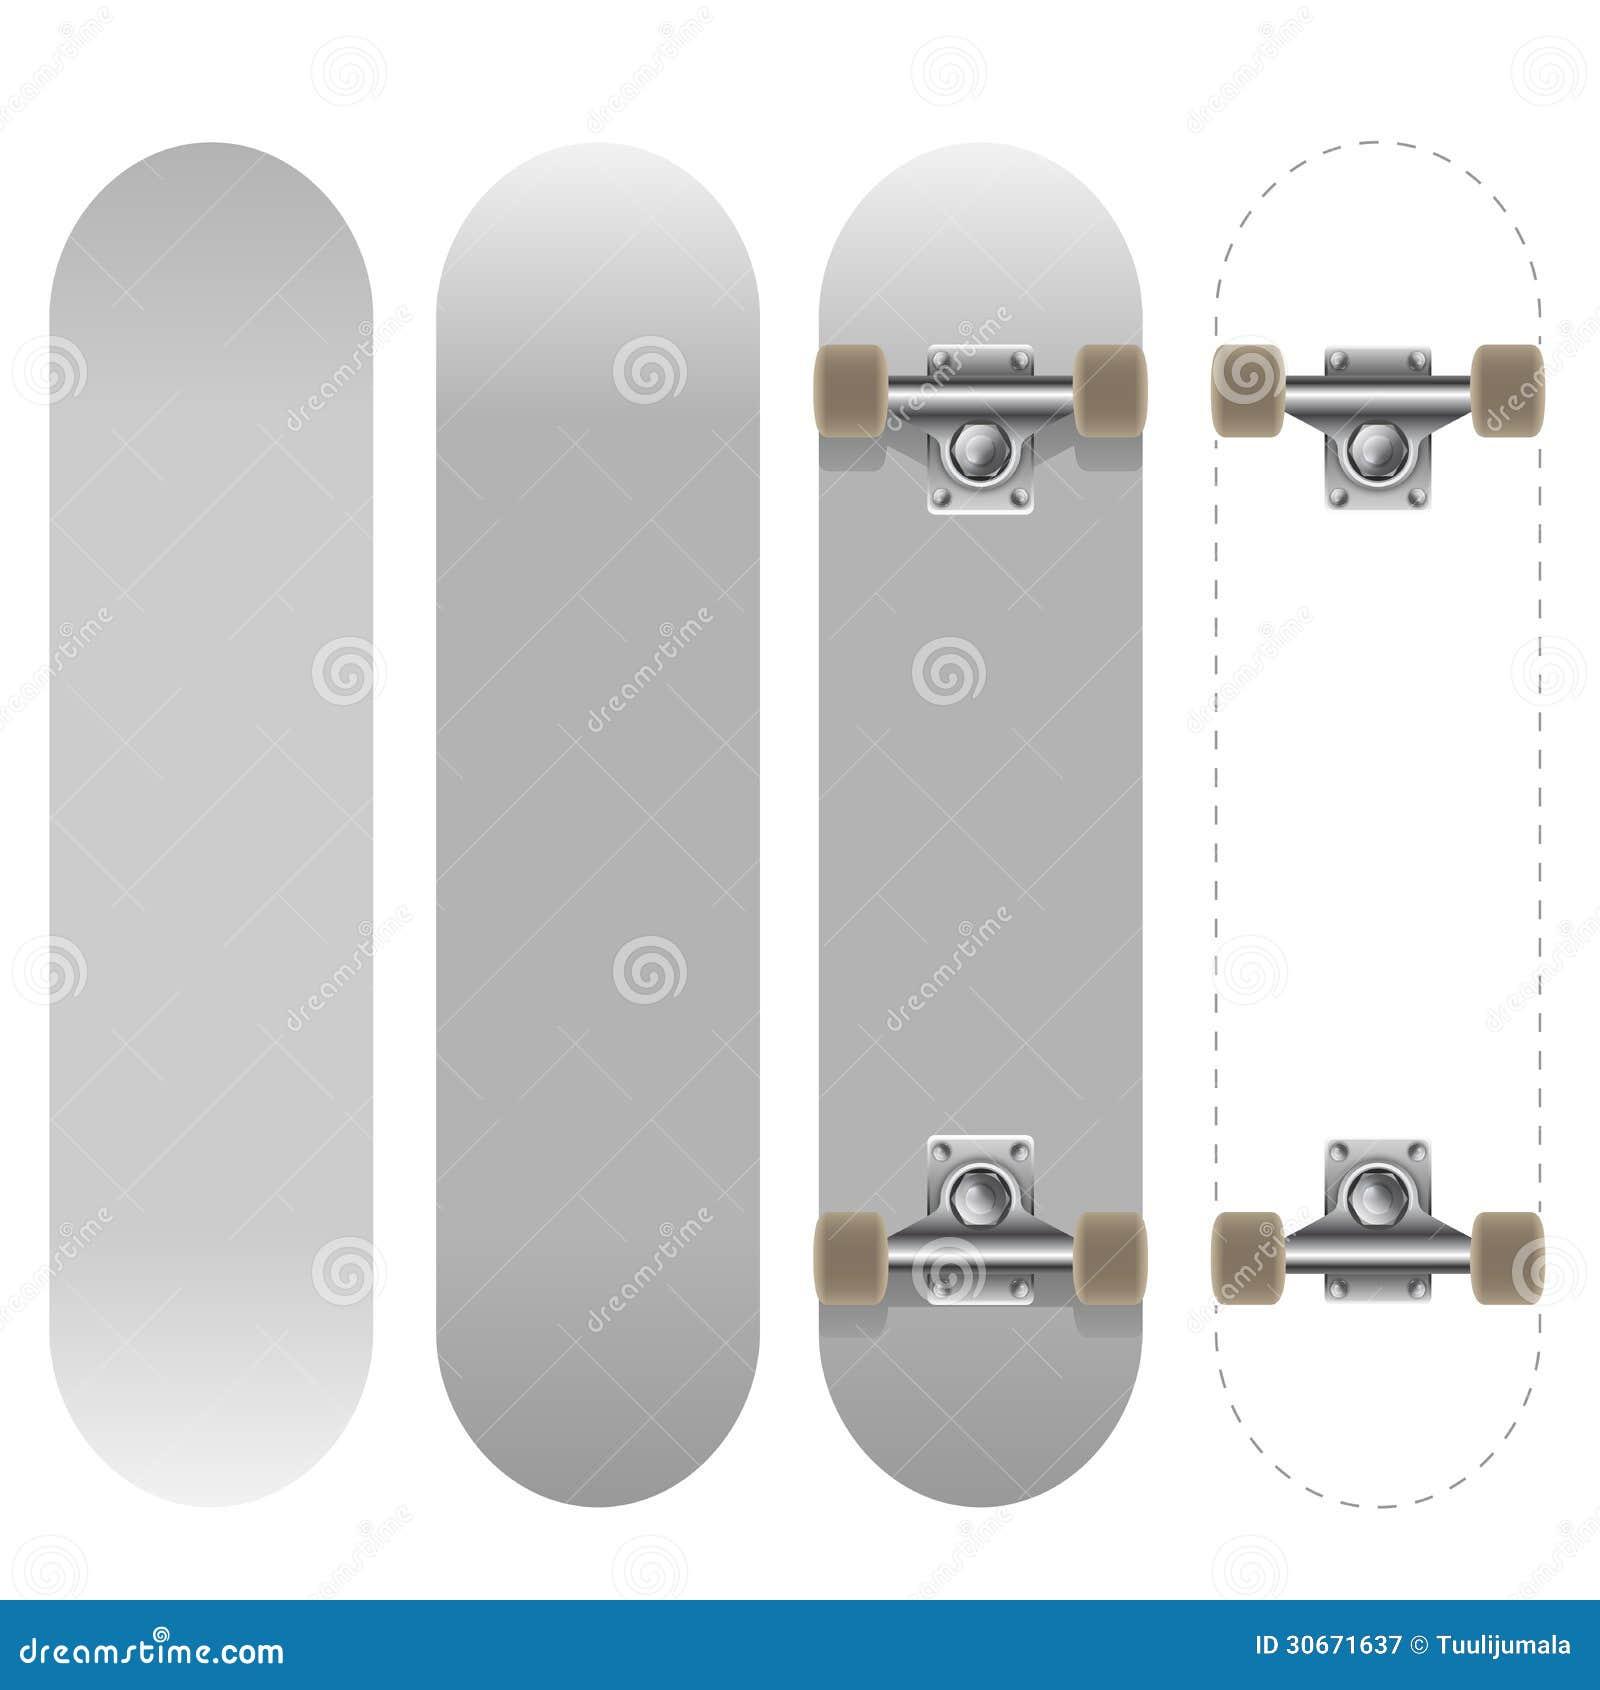 blank white skateboard template royalty free stock